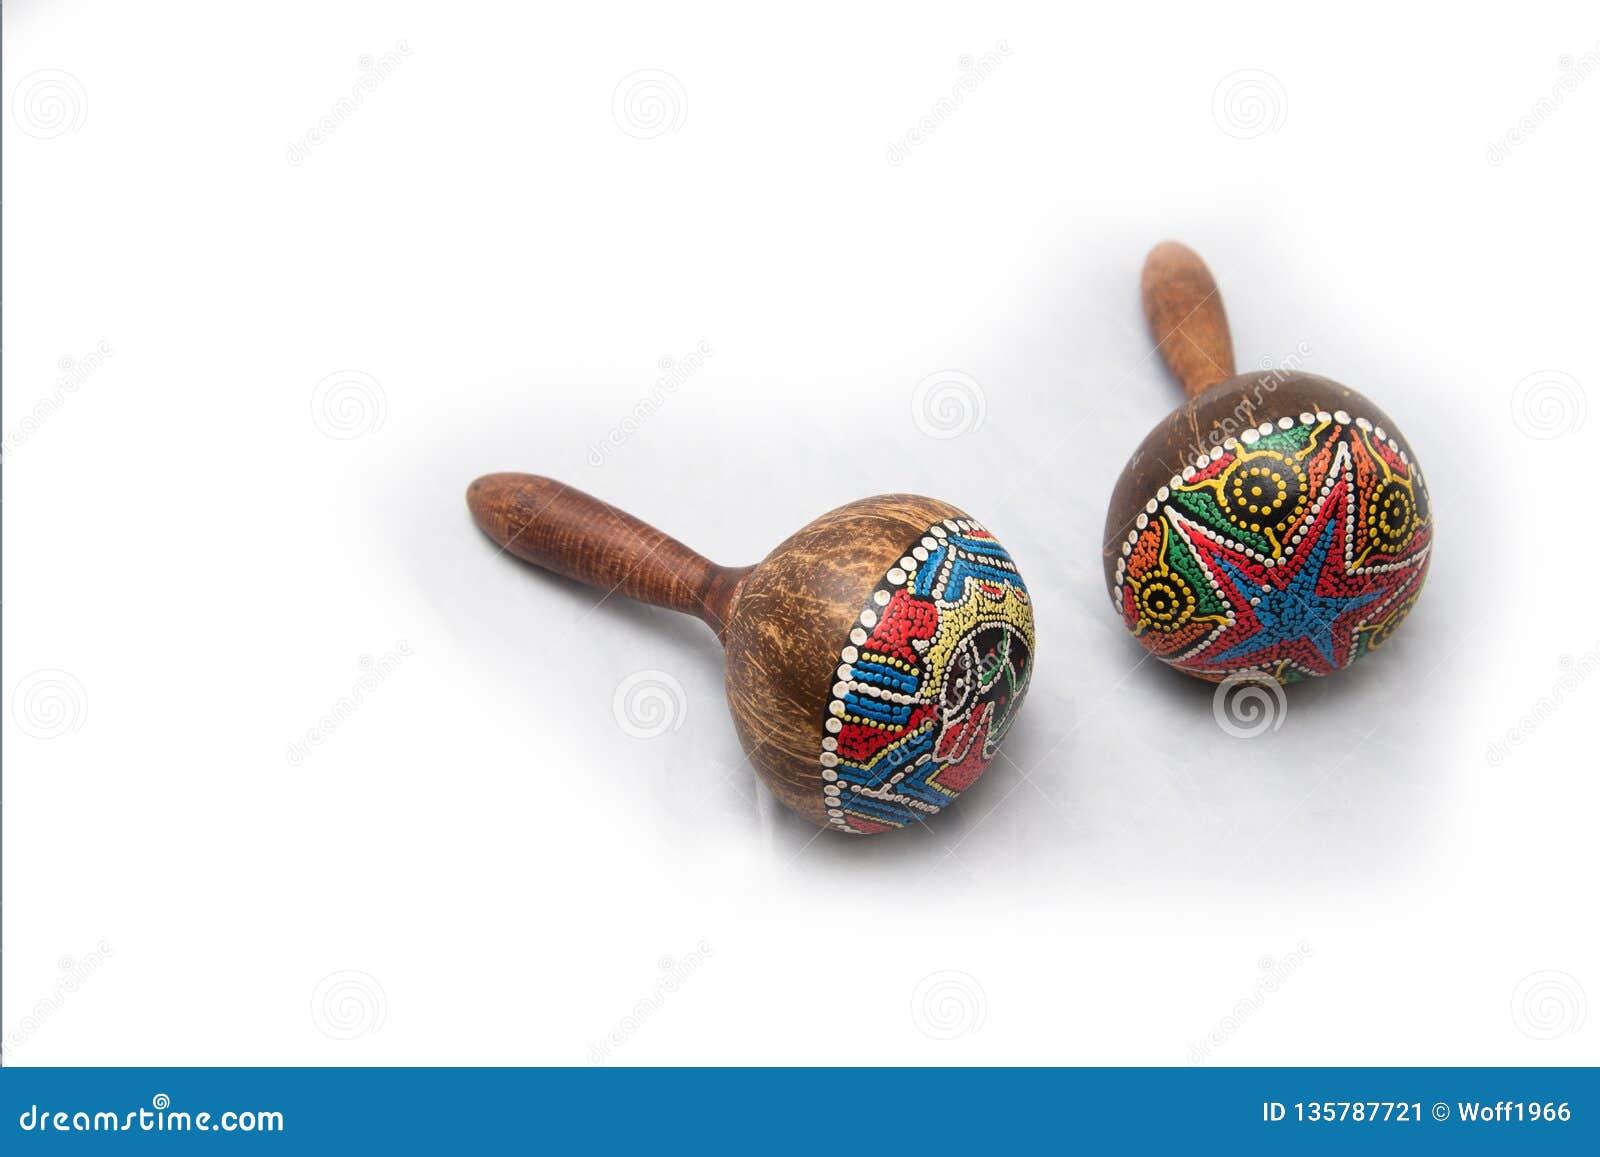 Instrumento musical tradicional feito de materiais naturais